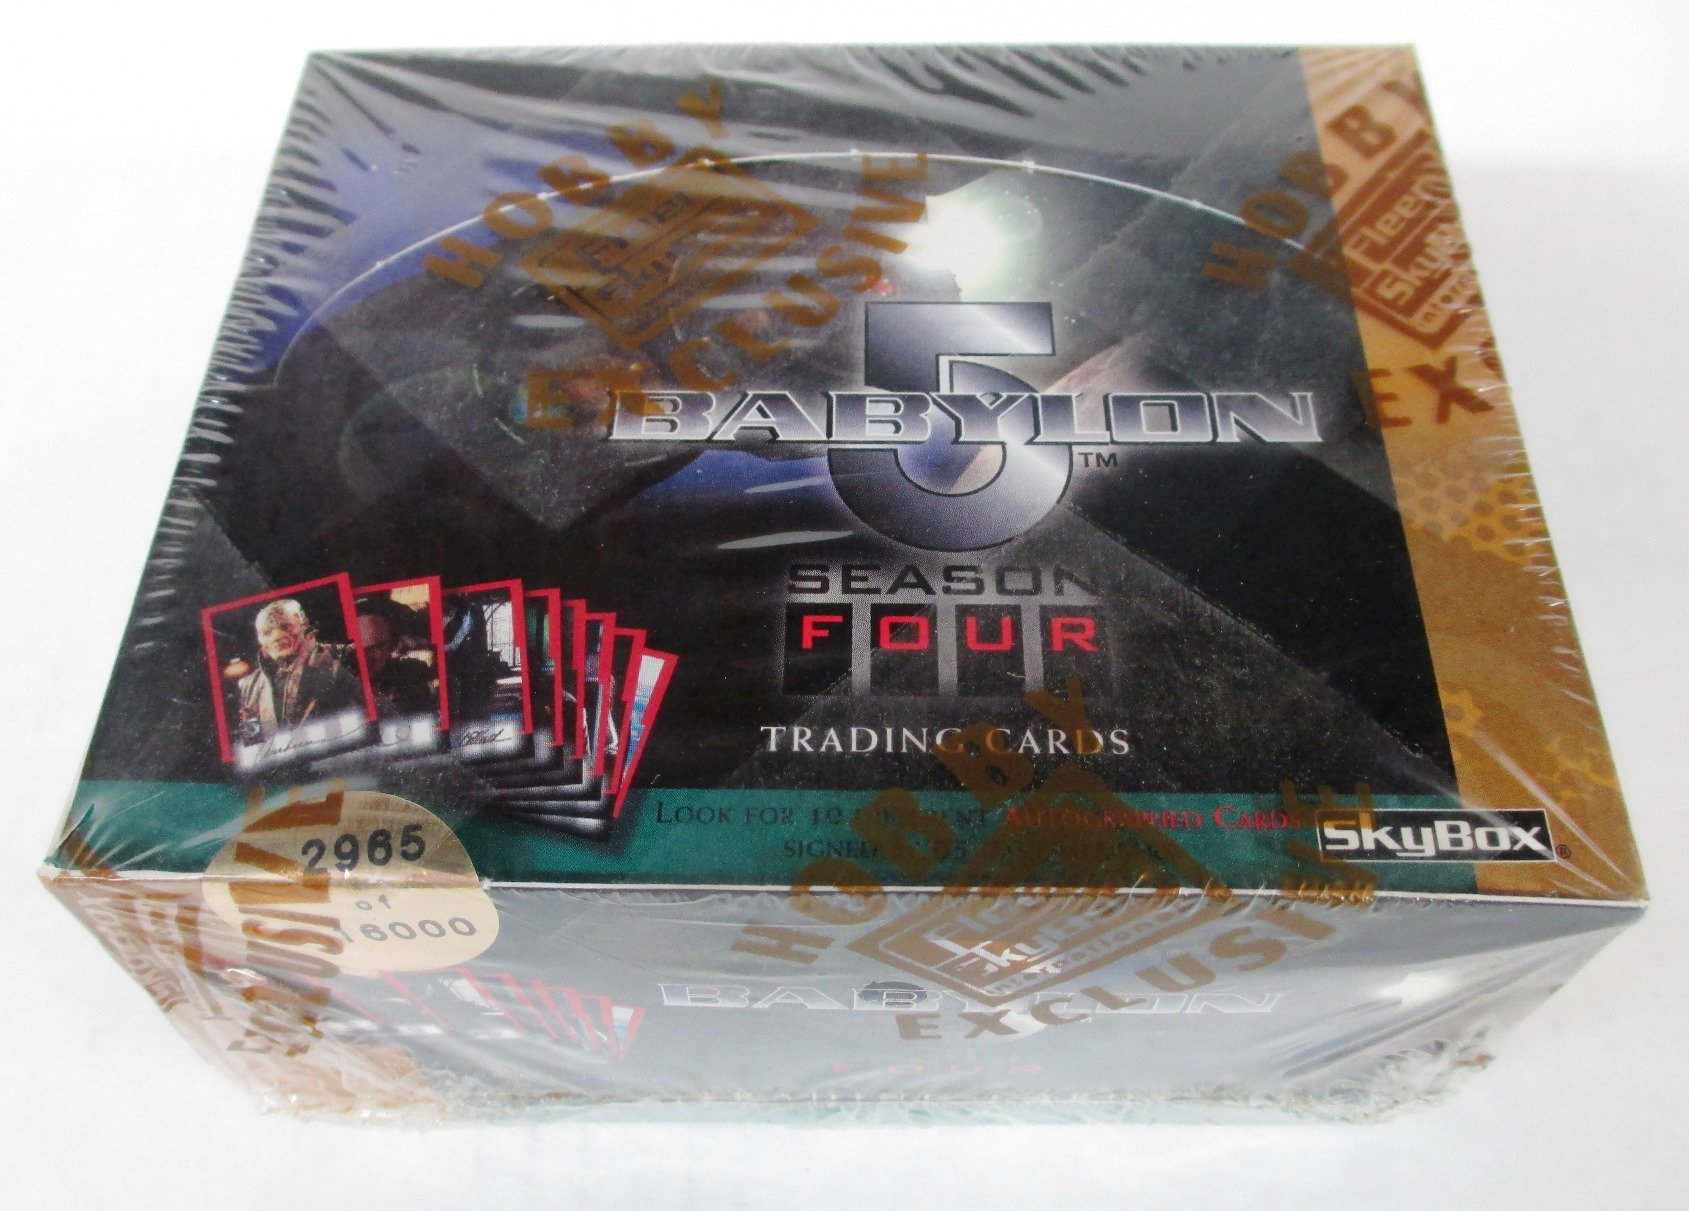 Babylon 5 Season 4 Trading Card Box Set by Skybox